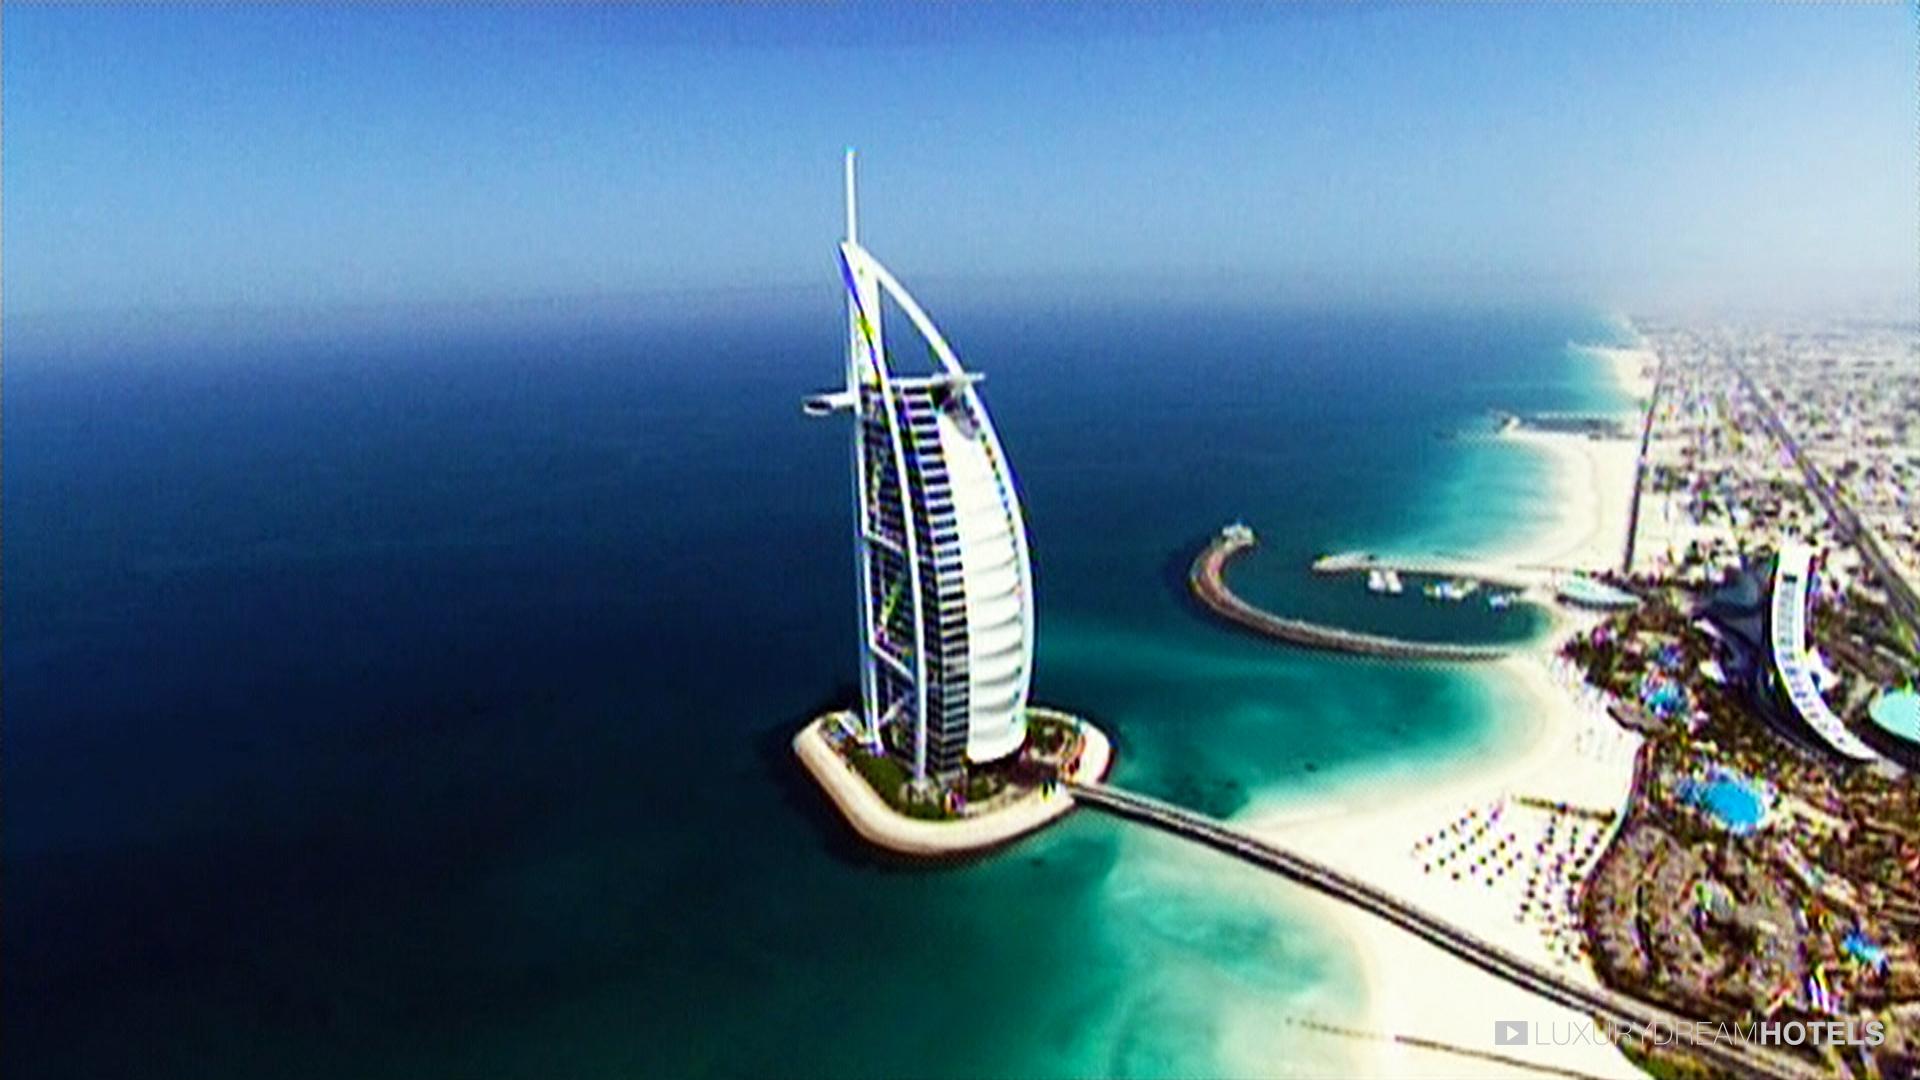 Hotel 7 Etoile Dubai luxury hotel, burj al arab, dubai, united arab emirates - luxury